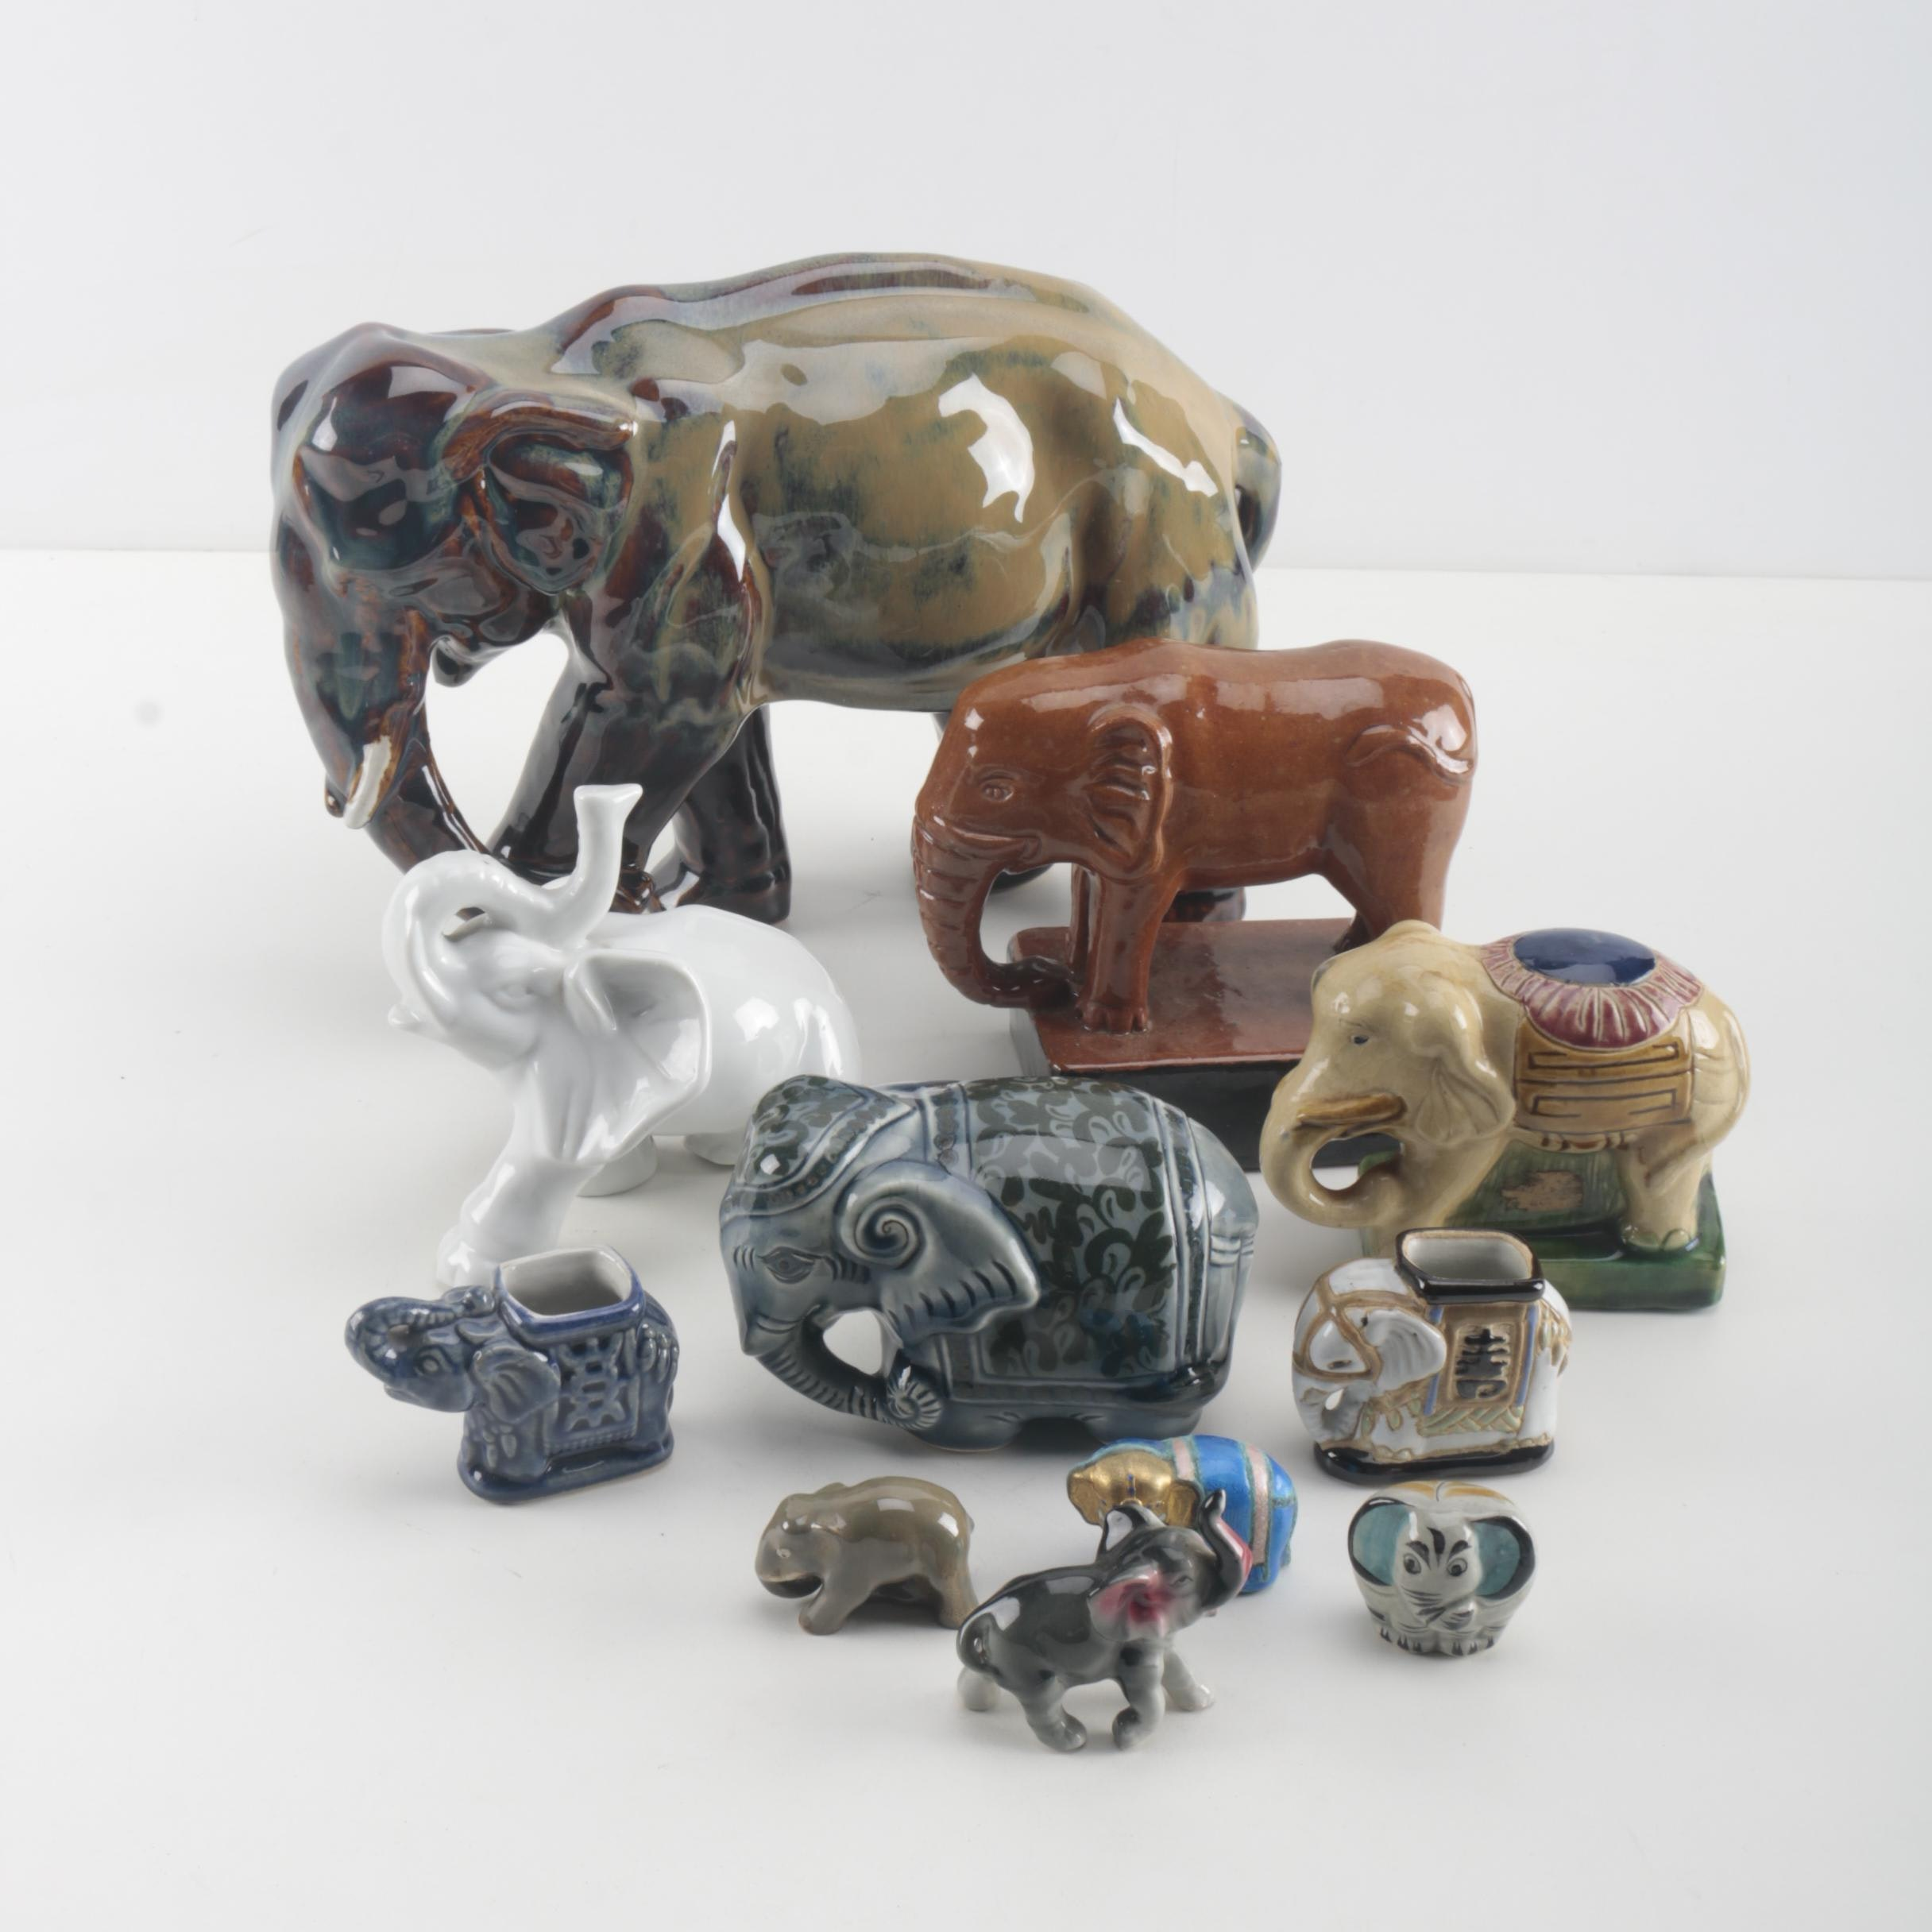 Ceramic Carved Elephant Figurines